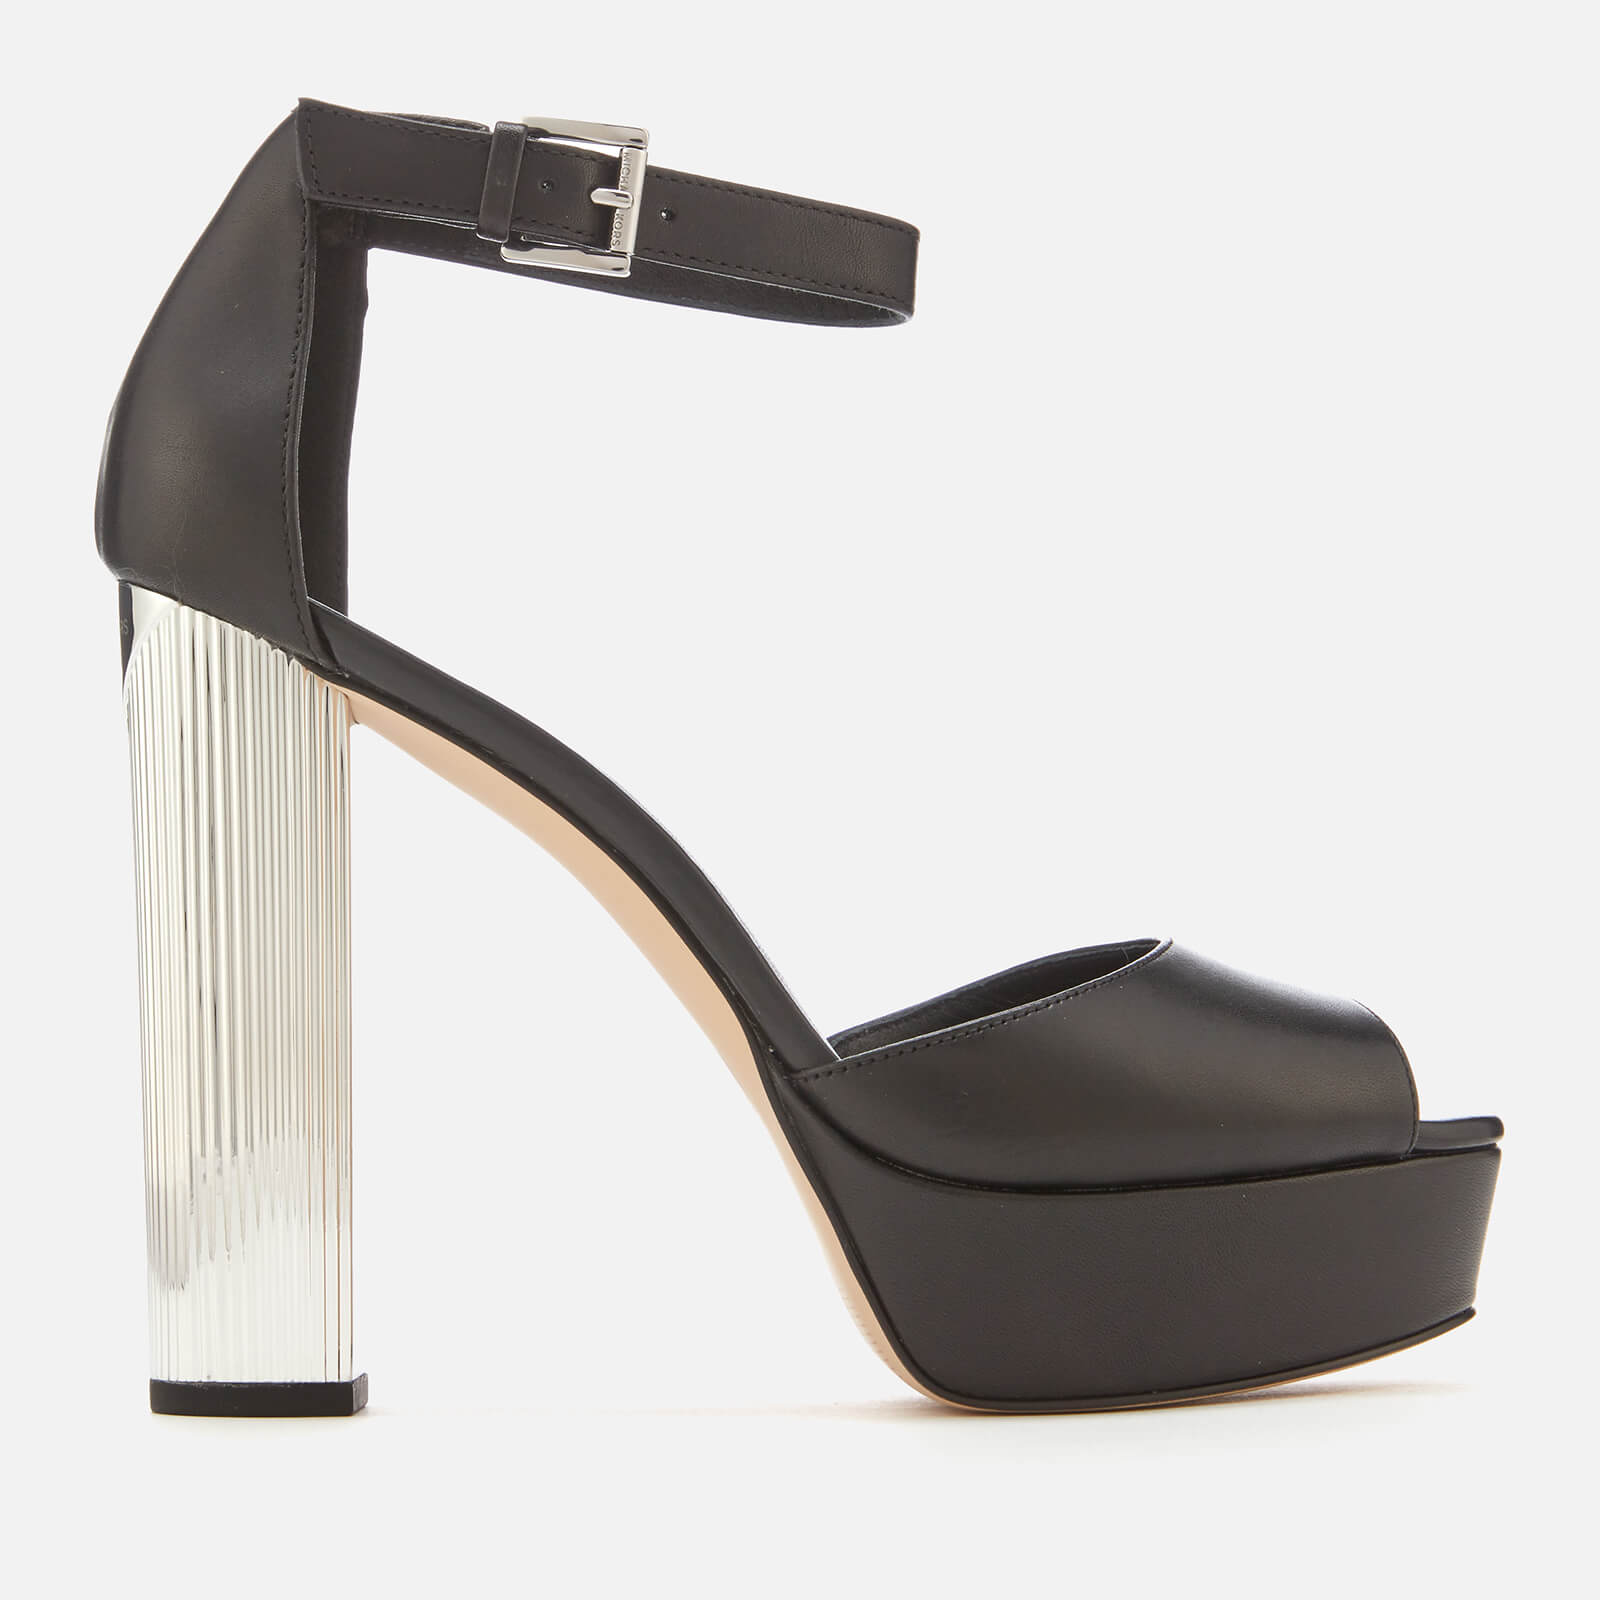 0de43ff4020a MICHAEL MICHAEL KORS Women s Paloma Leather Platform Heeled Sandals - Black  Womens Footwear